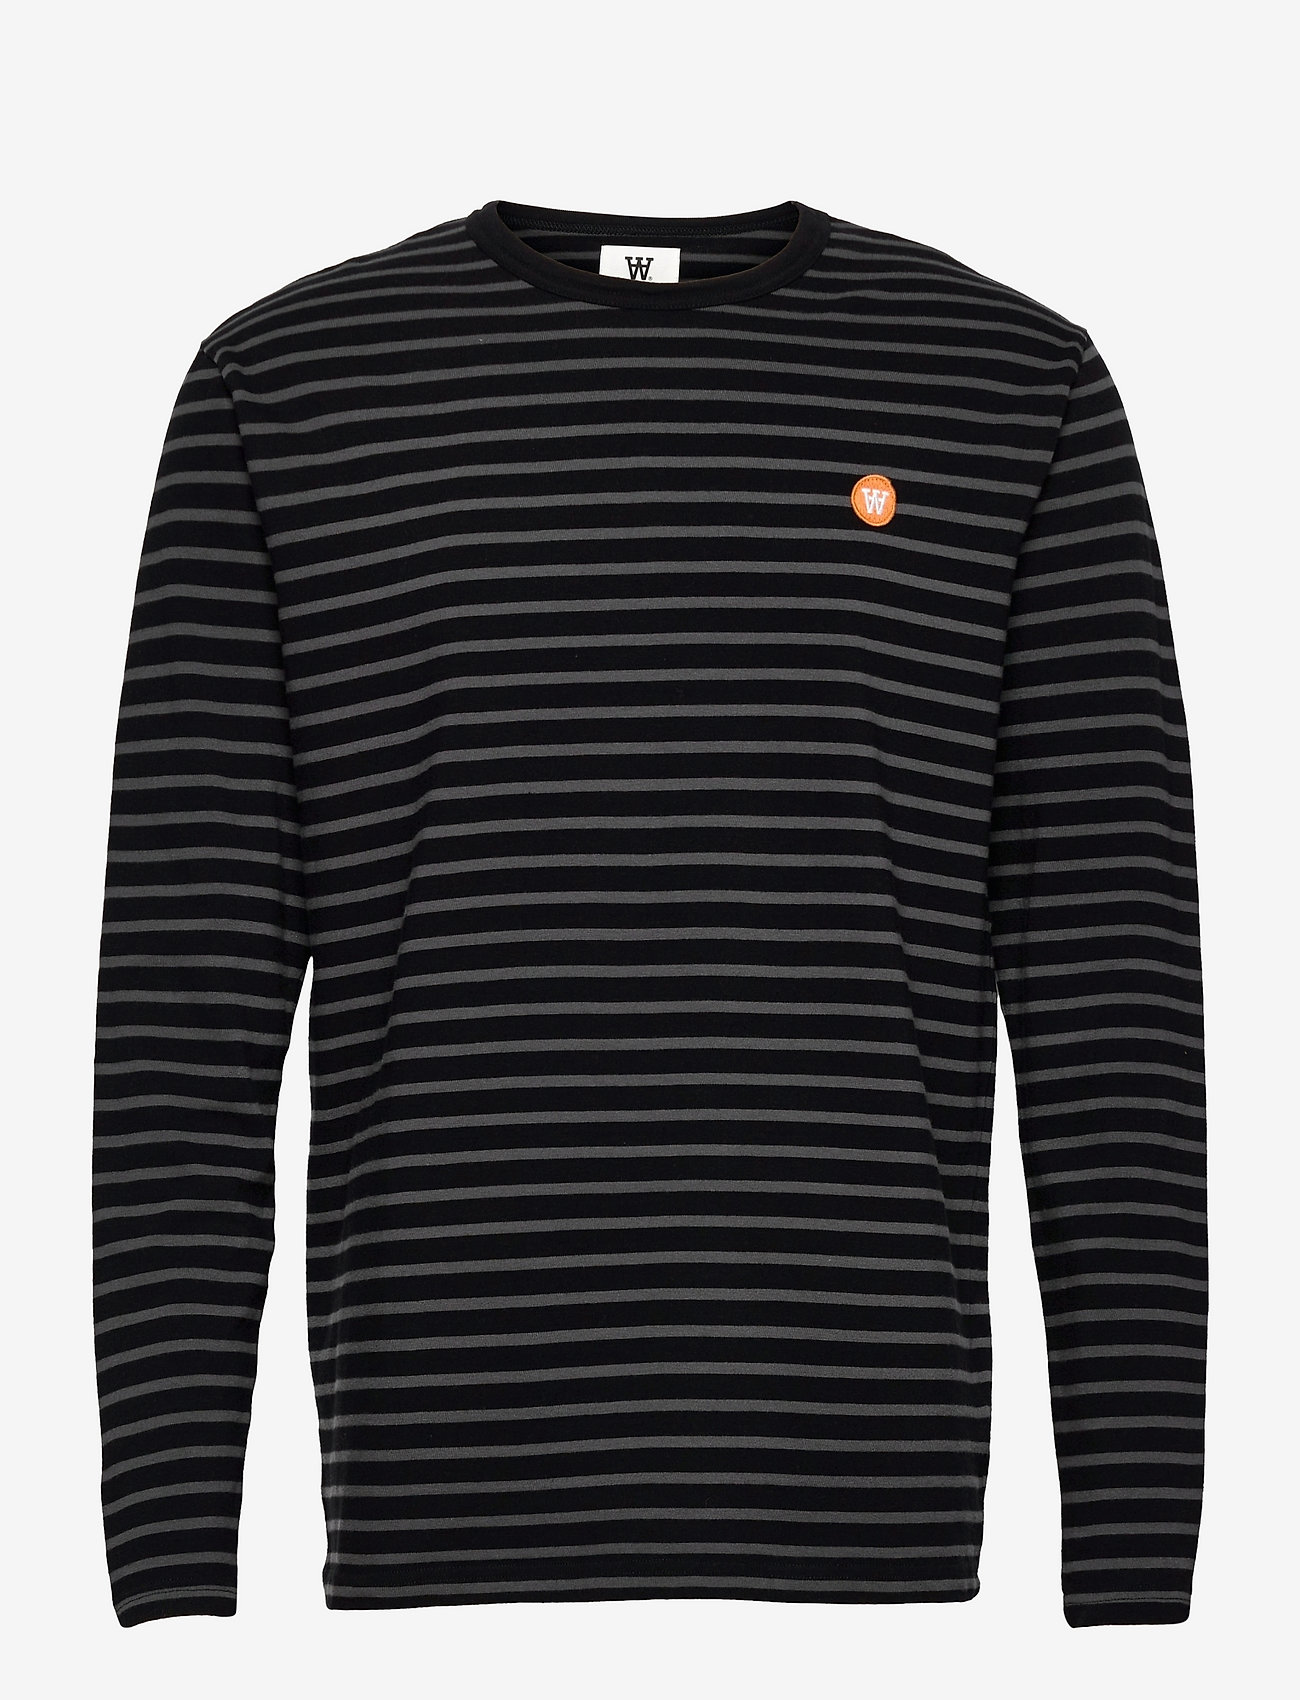 Wood Wood - Mel long sleeve - lange mouwen - black/grey stripes - 0